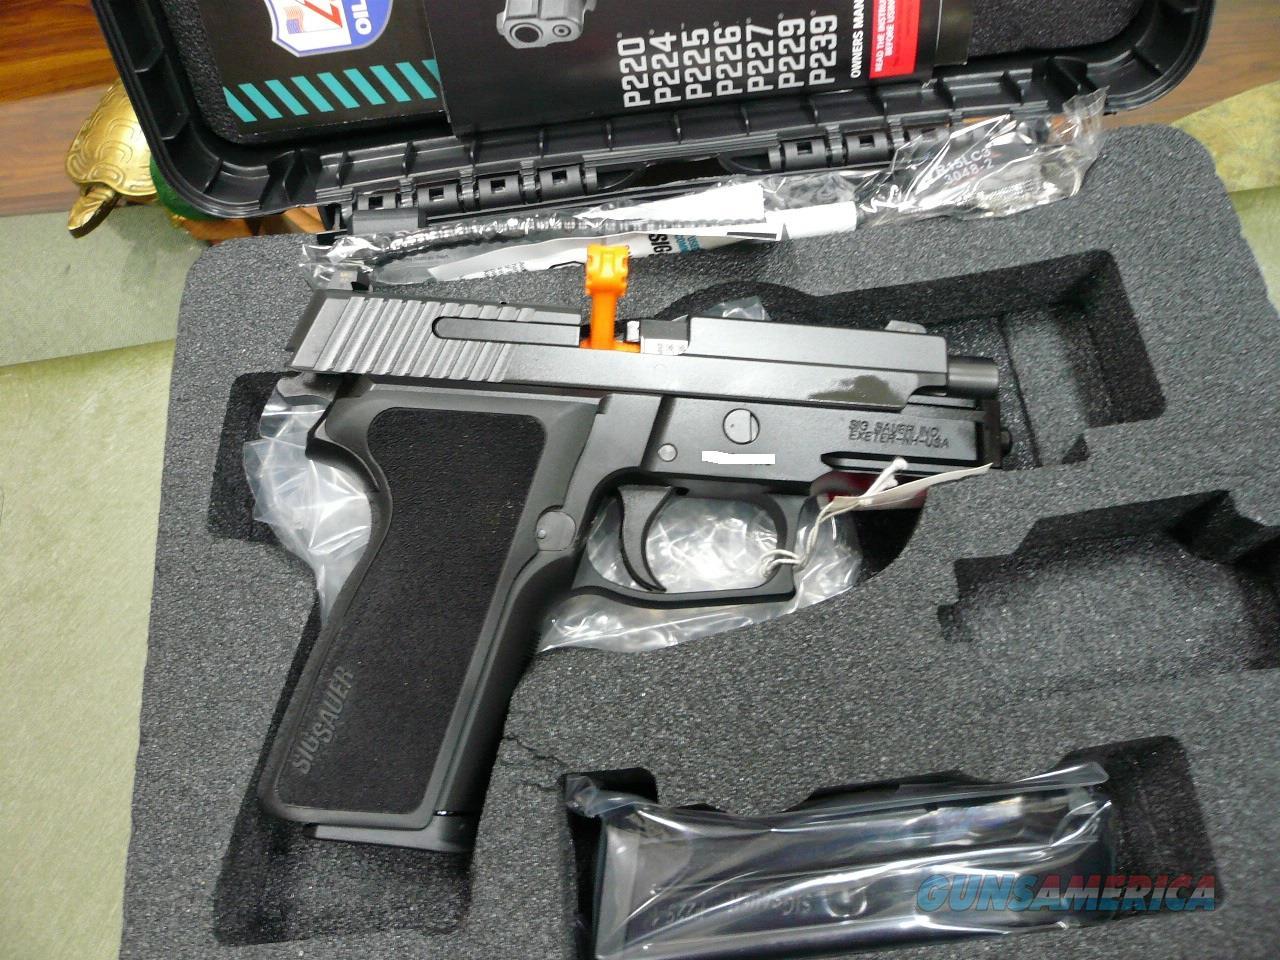 P229R,9mm NIB  Guns > Pistols > Sig - Sauer/Sigarms Pistols > P229